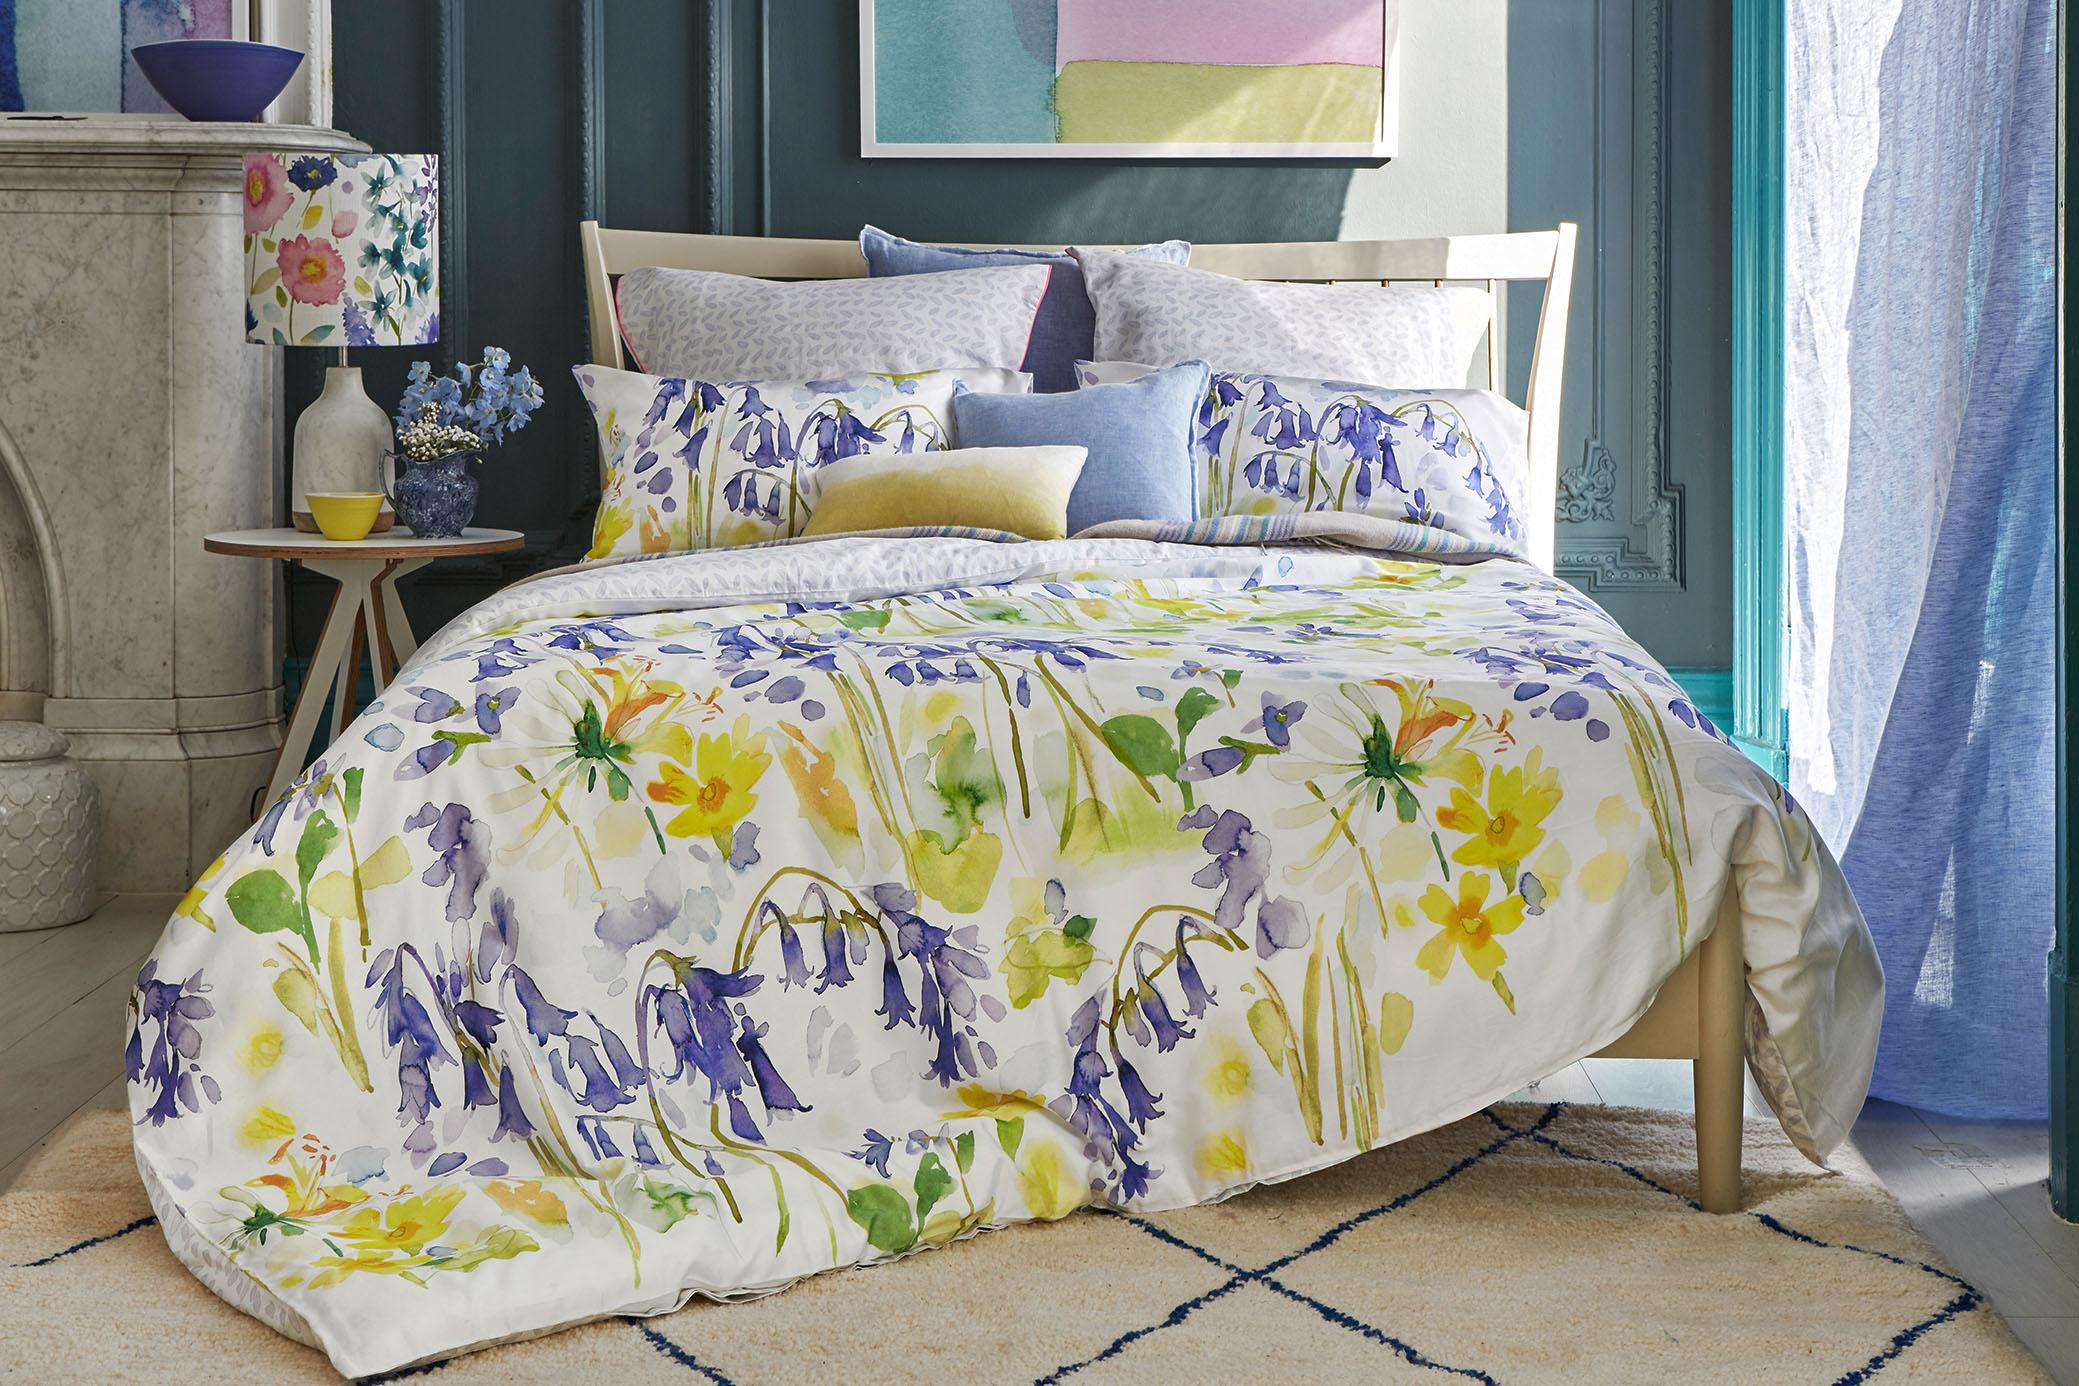 bluebellgray bedding sets have proved hugely popular